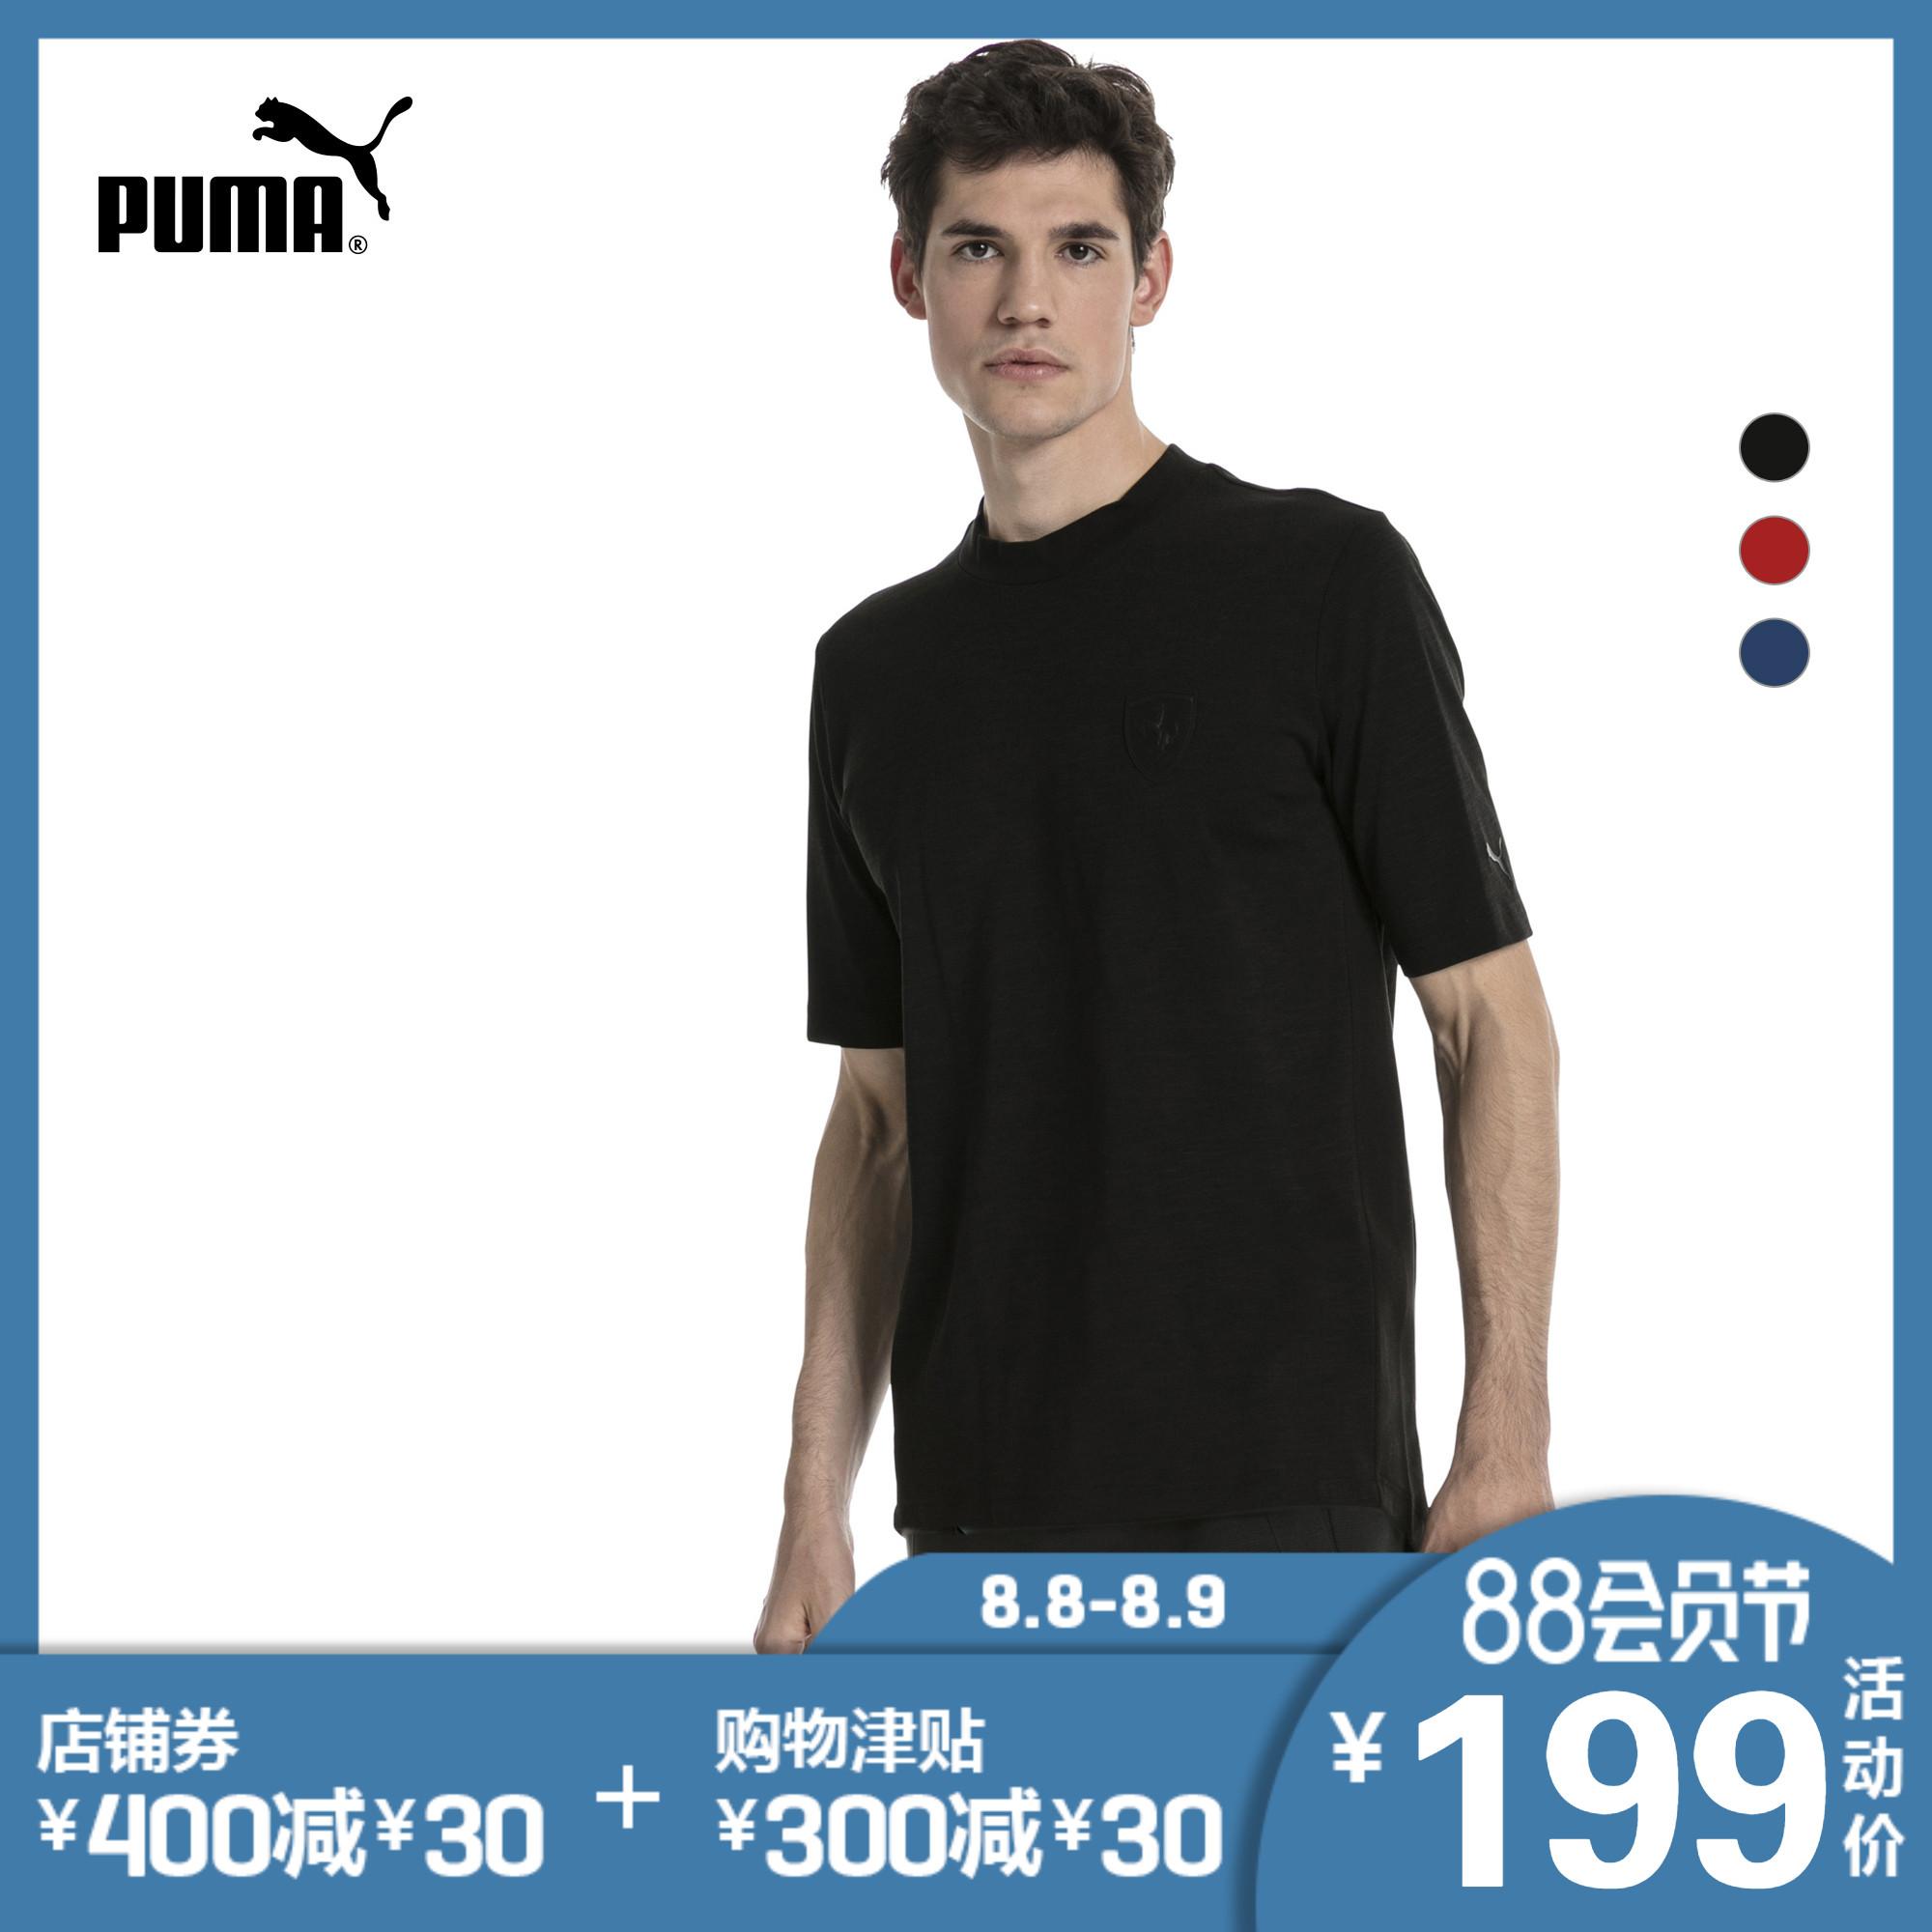 PUMA彪马官方正品 法拉利赛车系列春夏男子圆领短袖T恤 575237